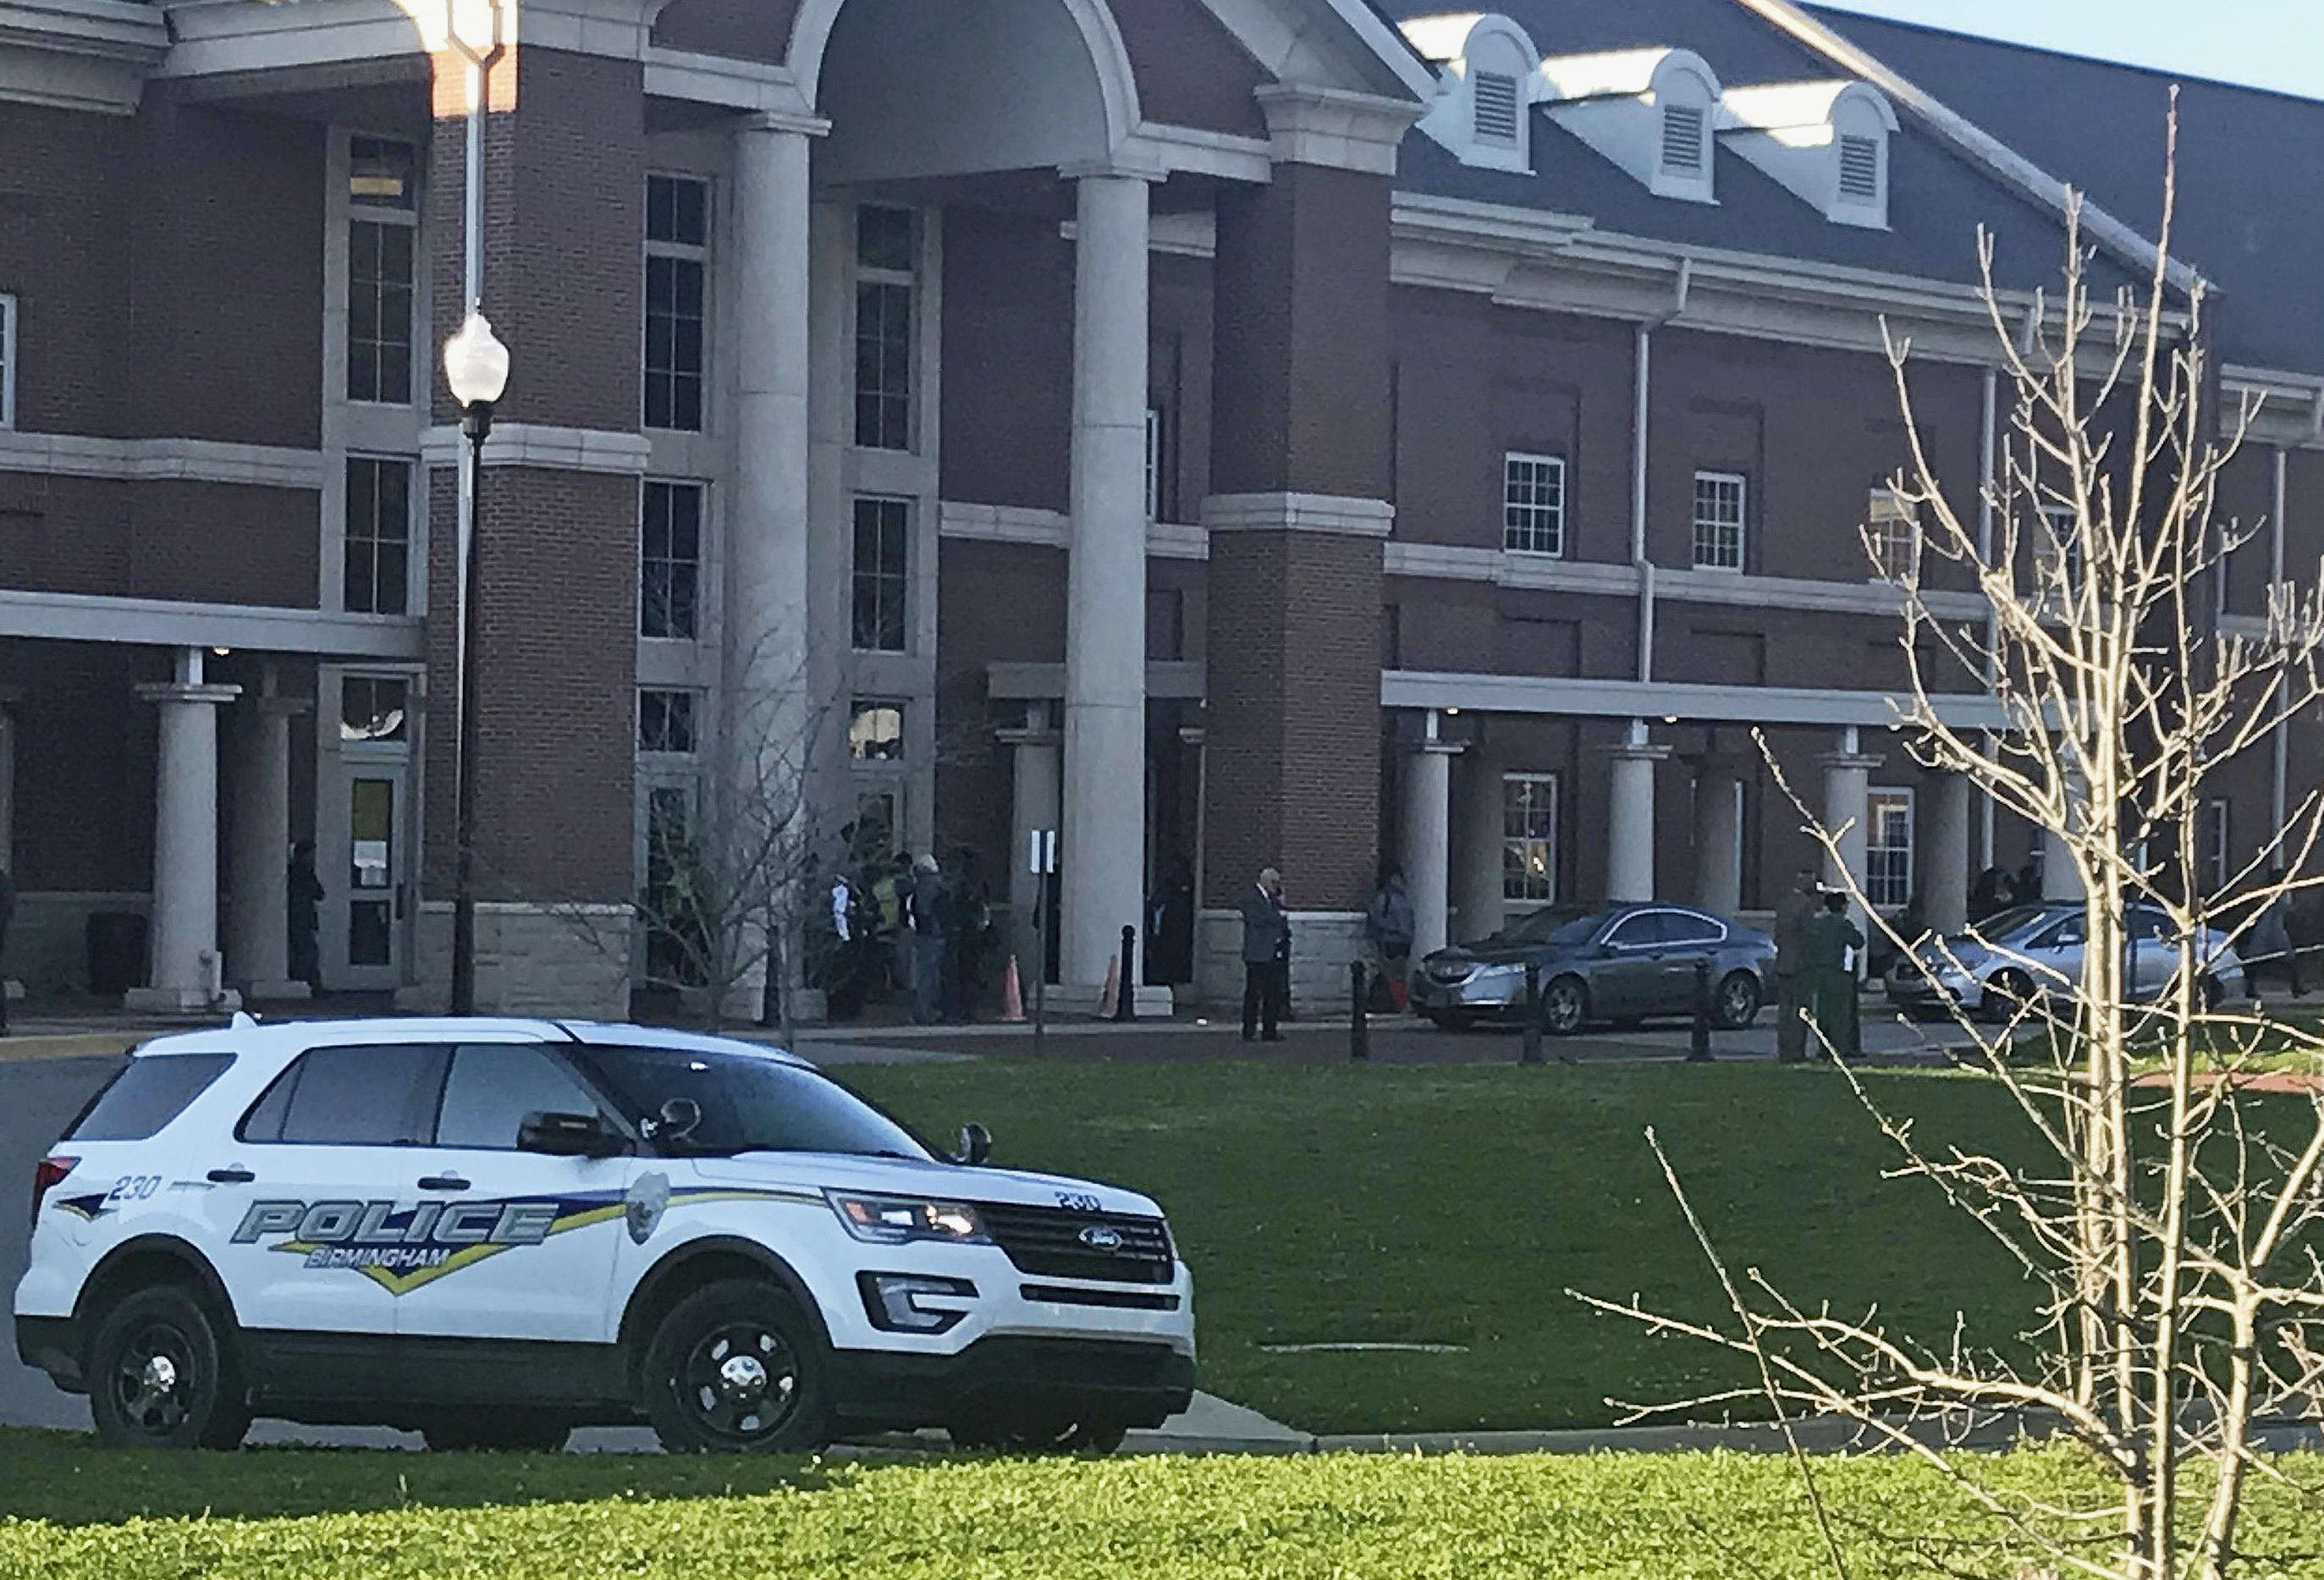 Usa, spari a scuola in Alabama: muore una studentessa 17enne